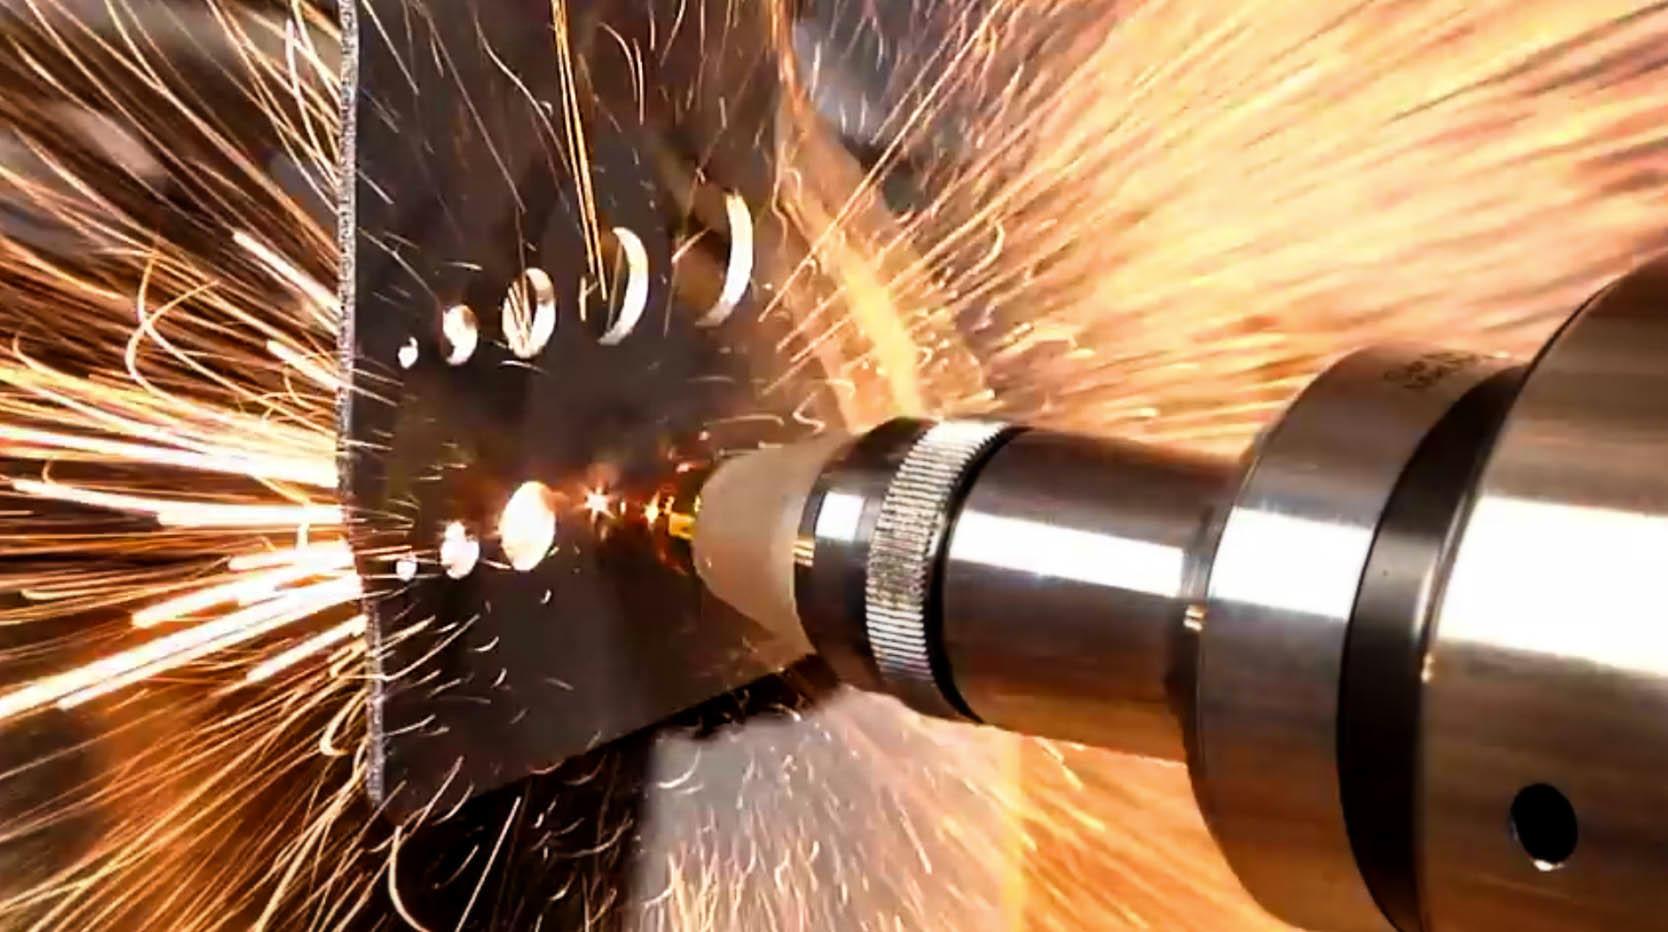 Aztec Powder Coating WFR, Inc. - Powder Coating in Indianapolis - Indianapolis, IN